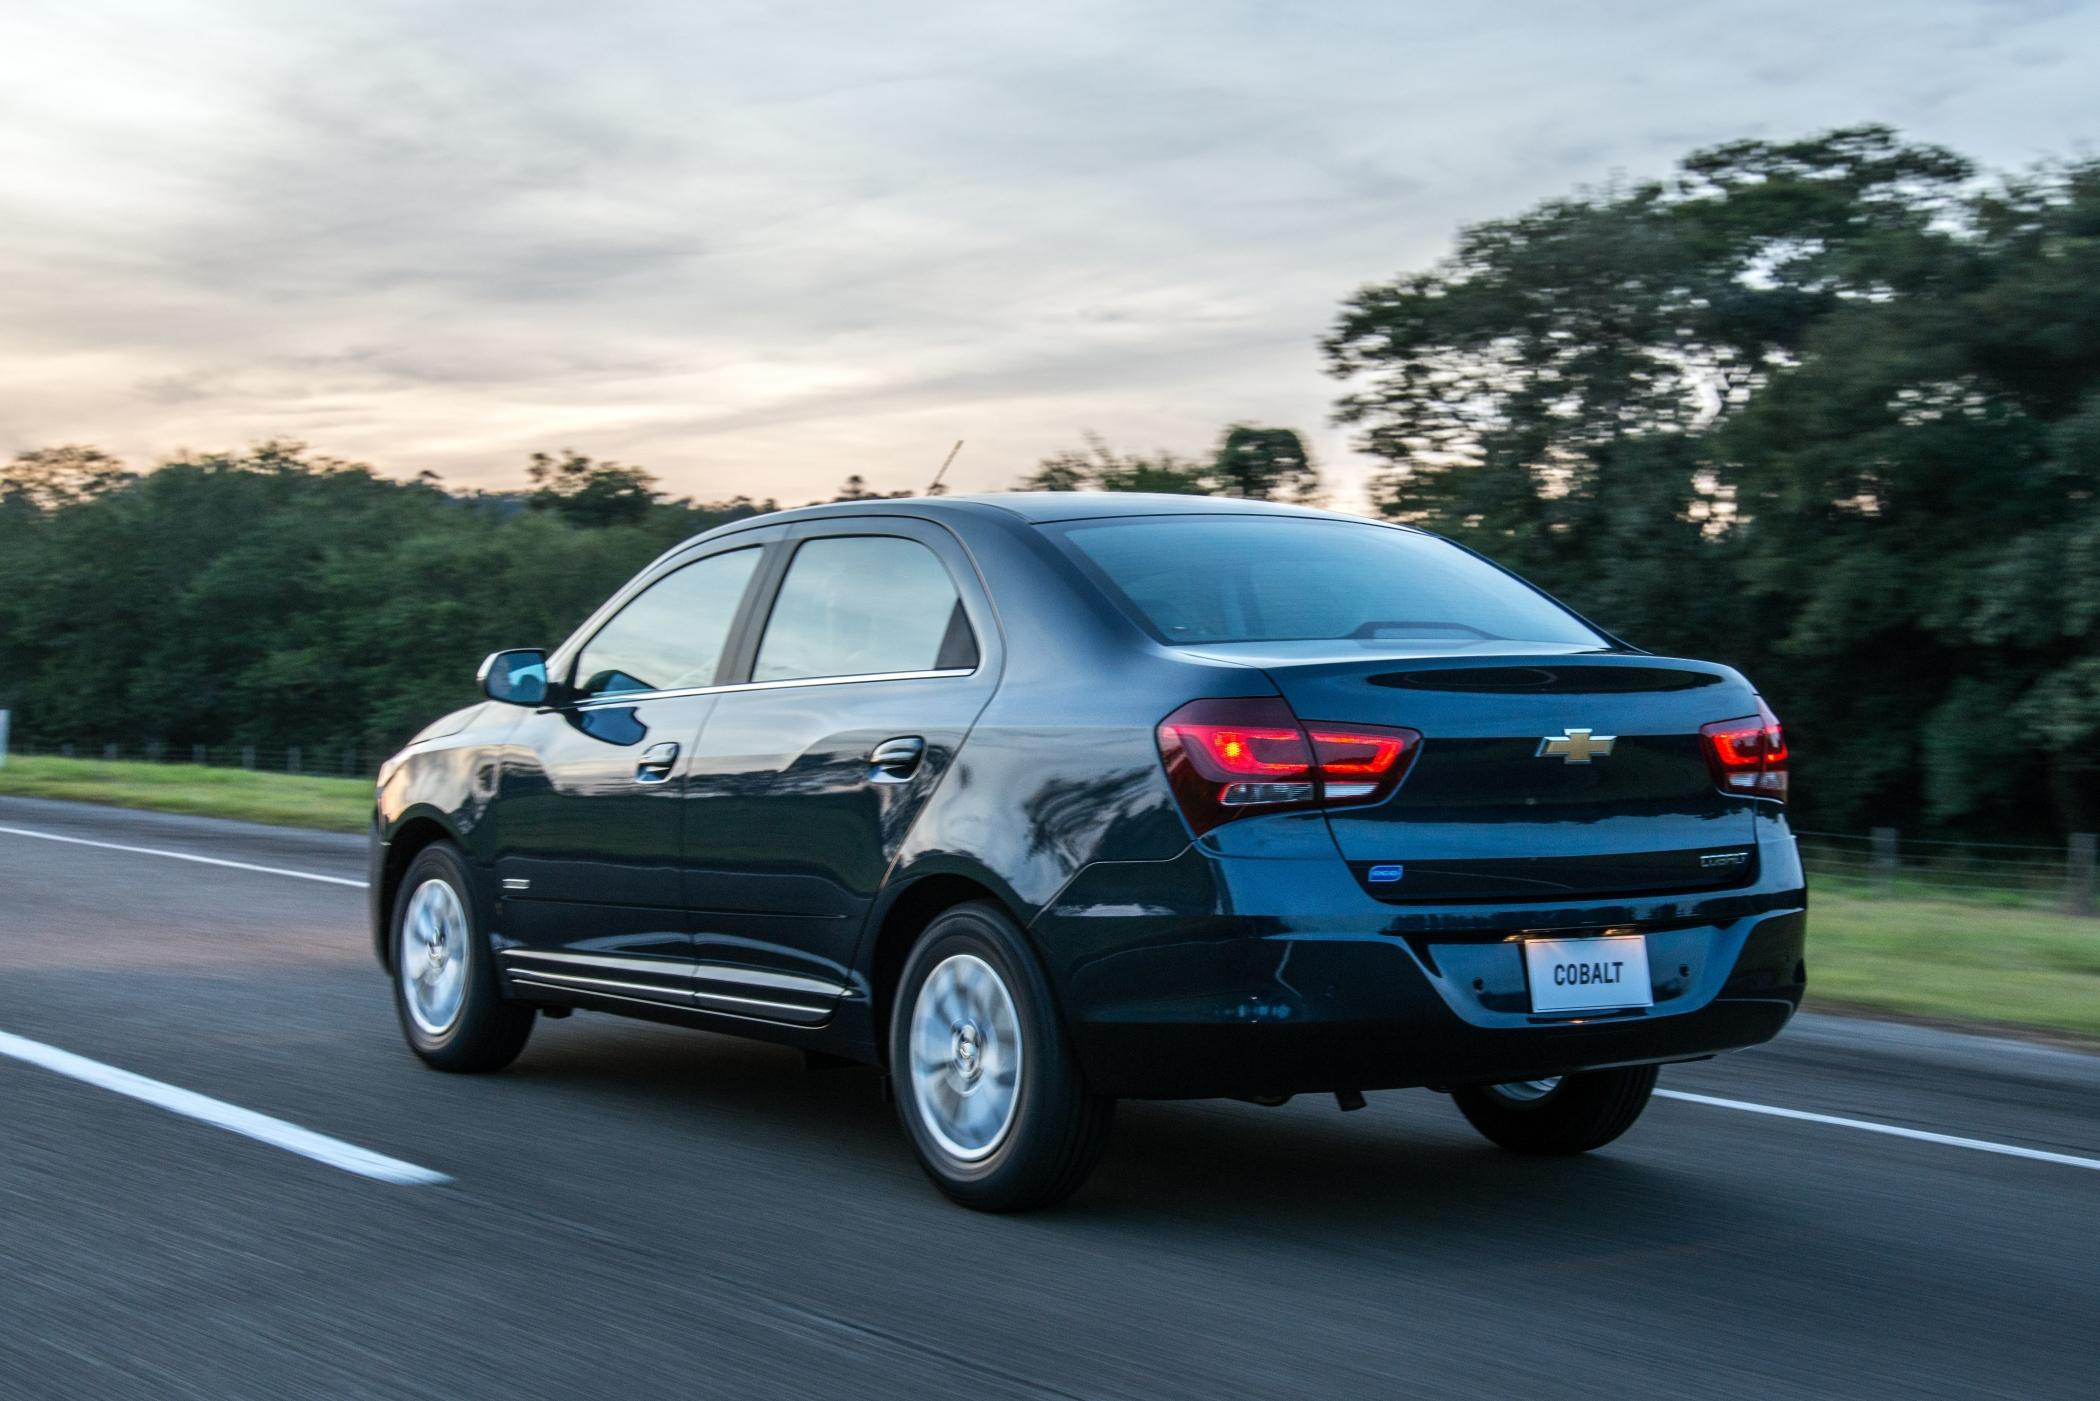 Traseira do Chevrolet Cobalt azul na estrada